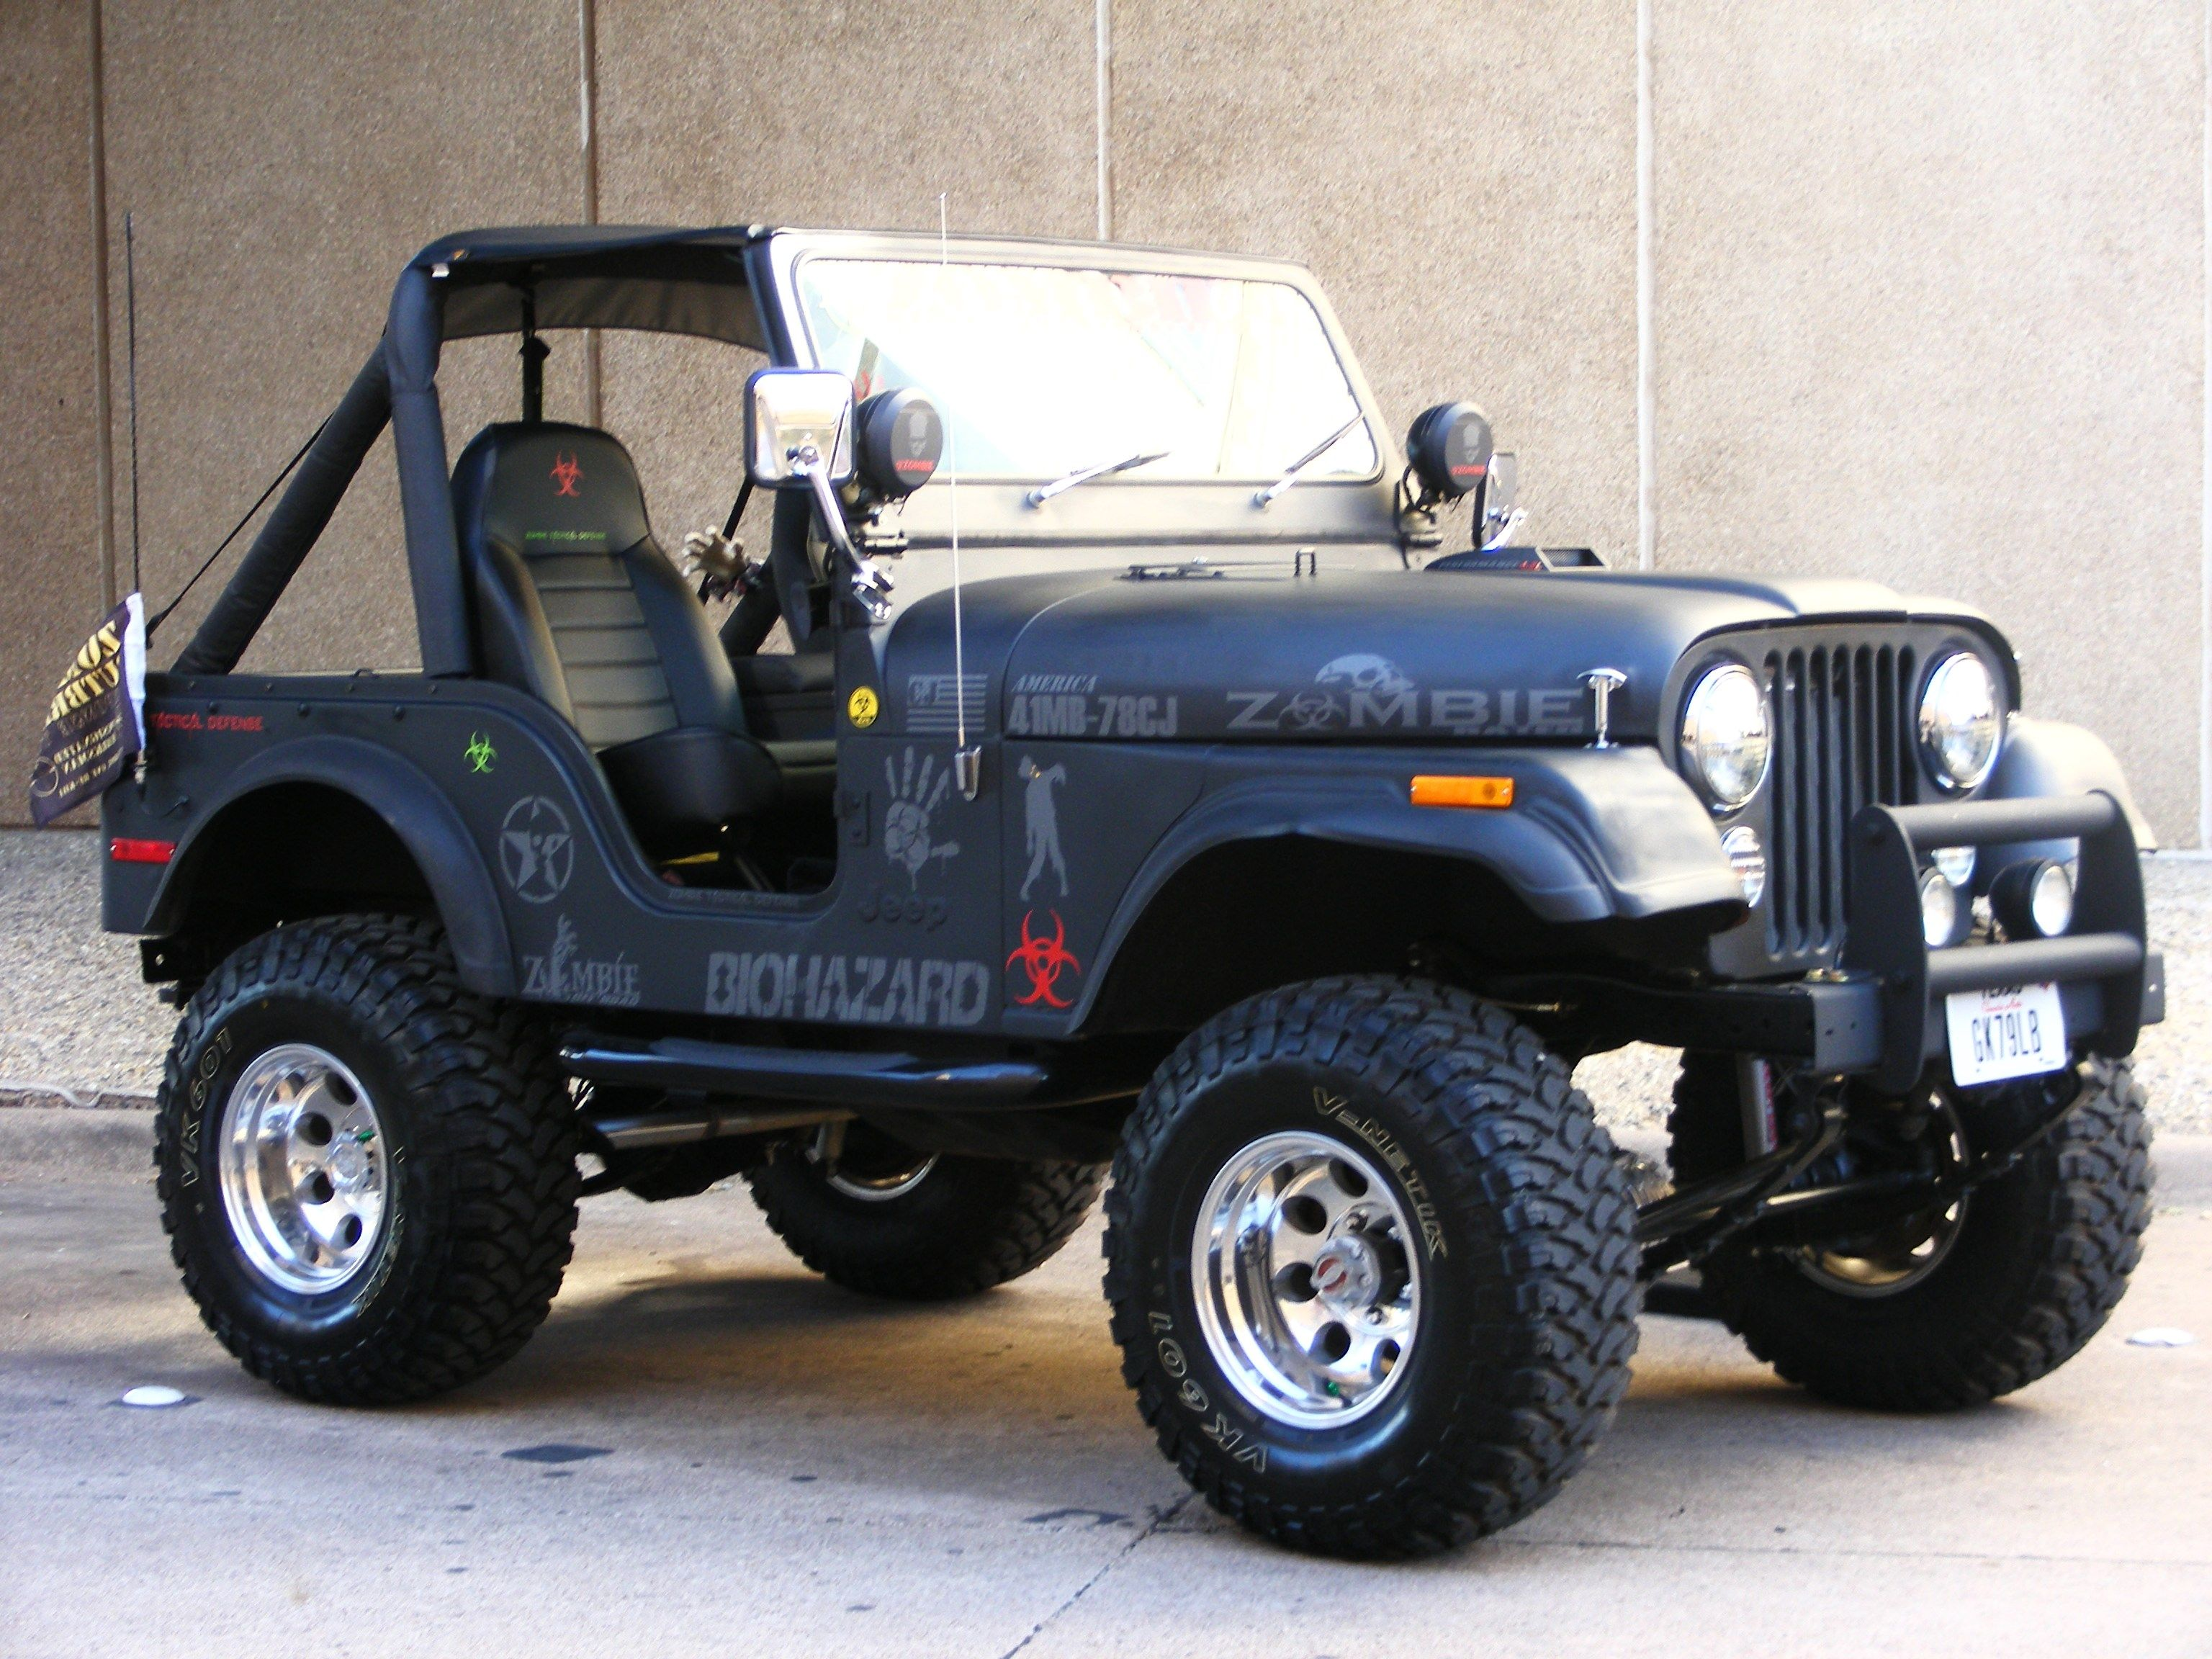 1978 Cj5 Zombie Rig Jeep Cj Jeep Jeep Life